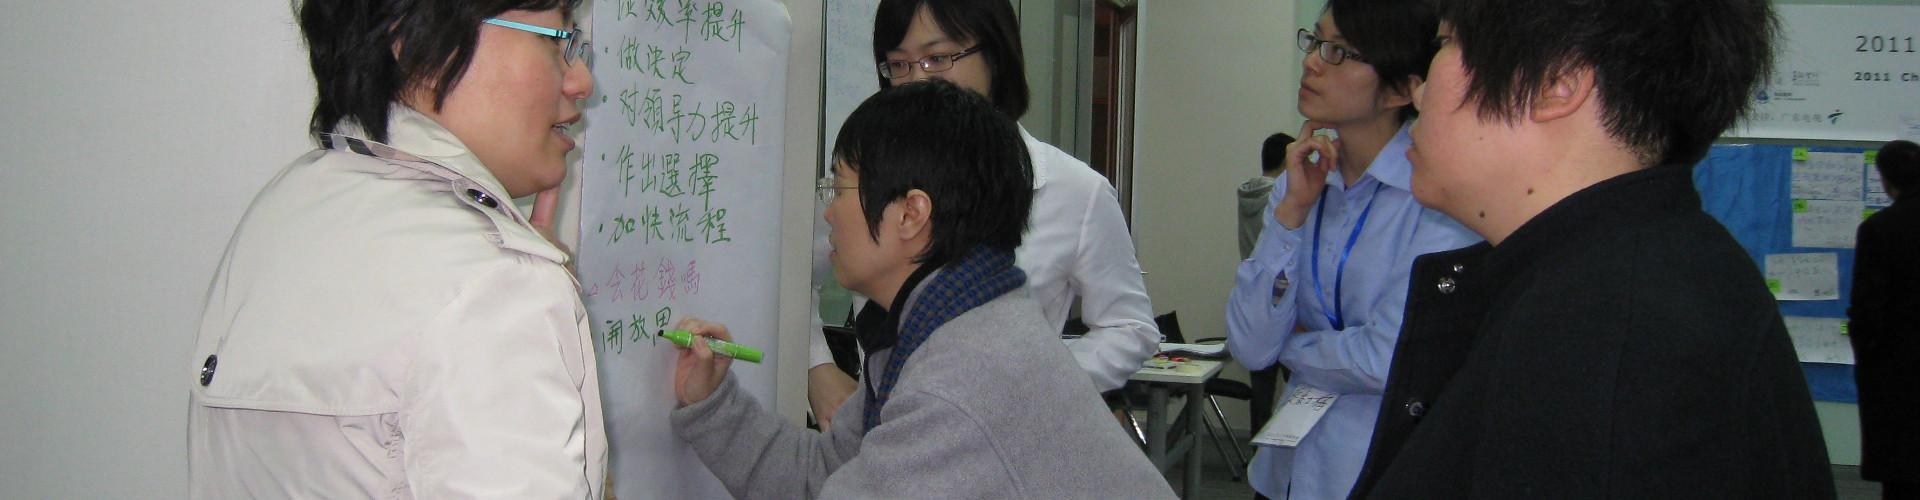 People writing texts on white paper during an exercise / 學員在培訓活動中於白紙上寫字 / 学员在培训活动中于白纸上写字